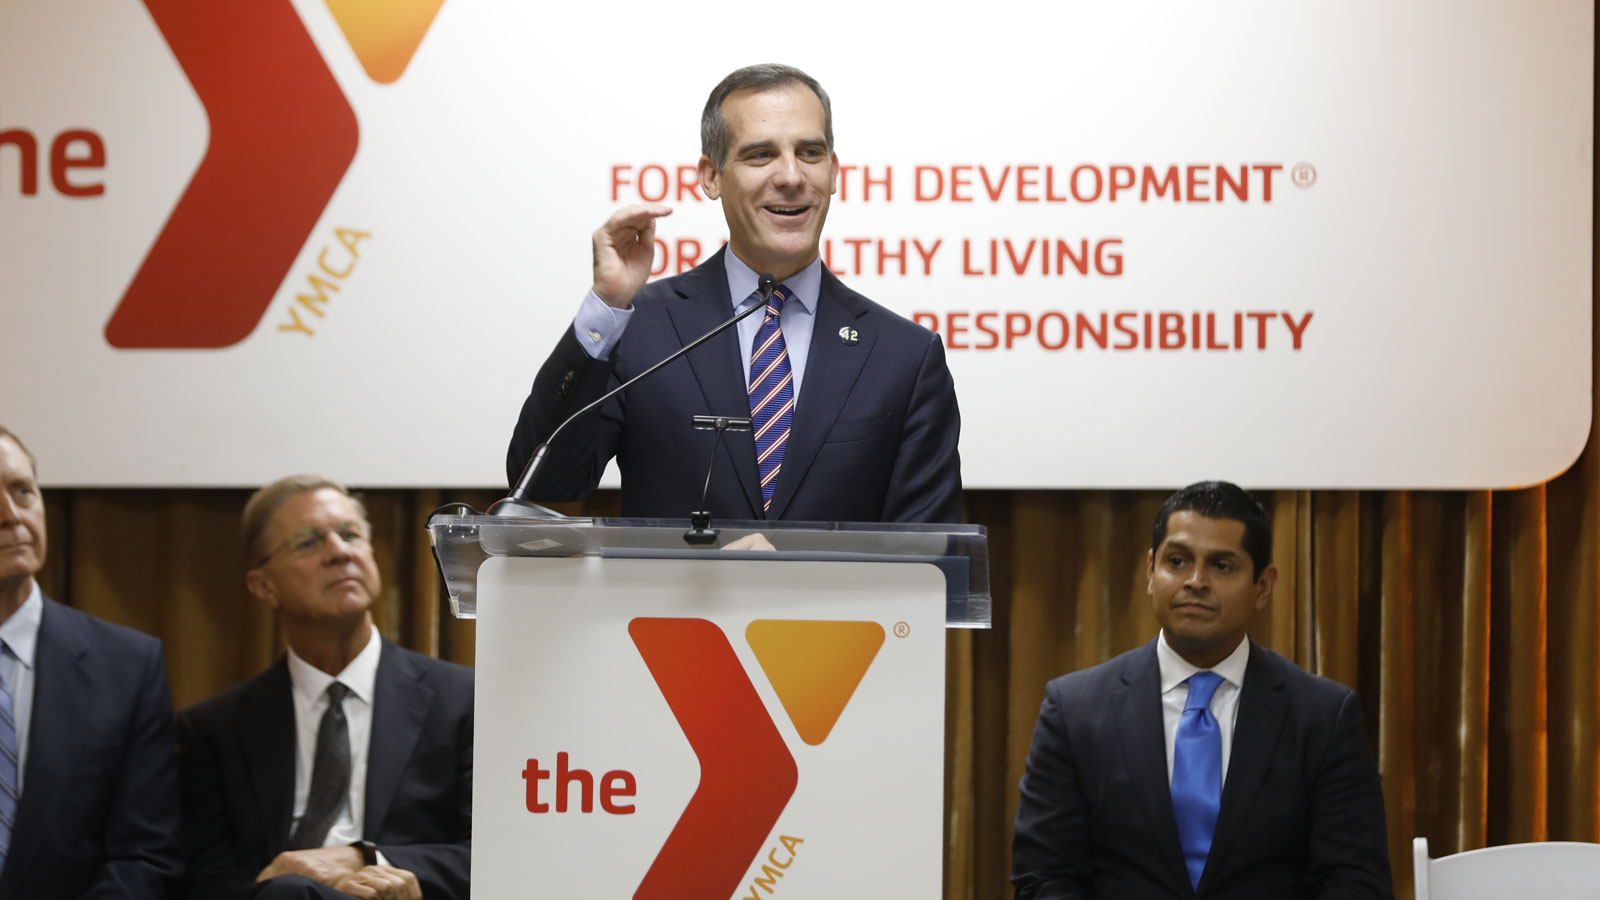 Mayor Eric Garcetti announces Achieve LA, a partnership between Cal State LA and the YMCA of Metropolitan Los Angeles